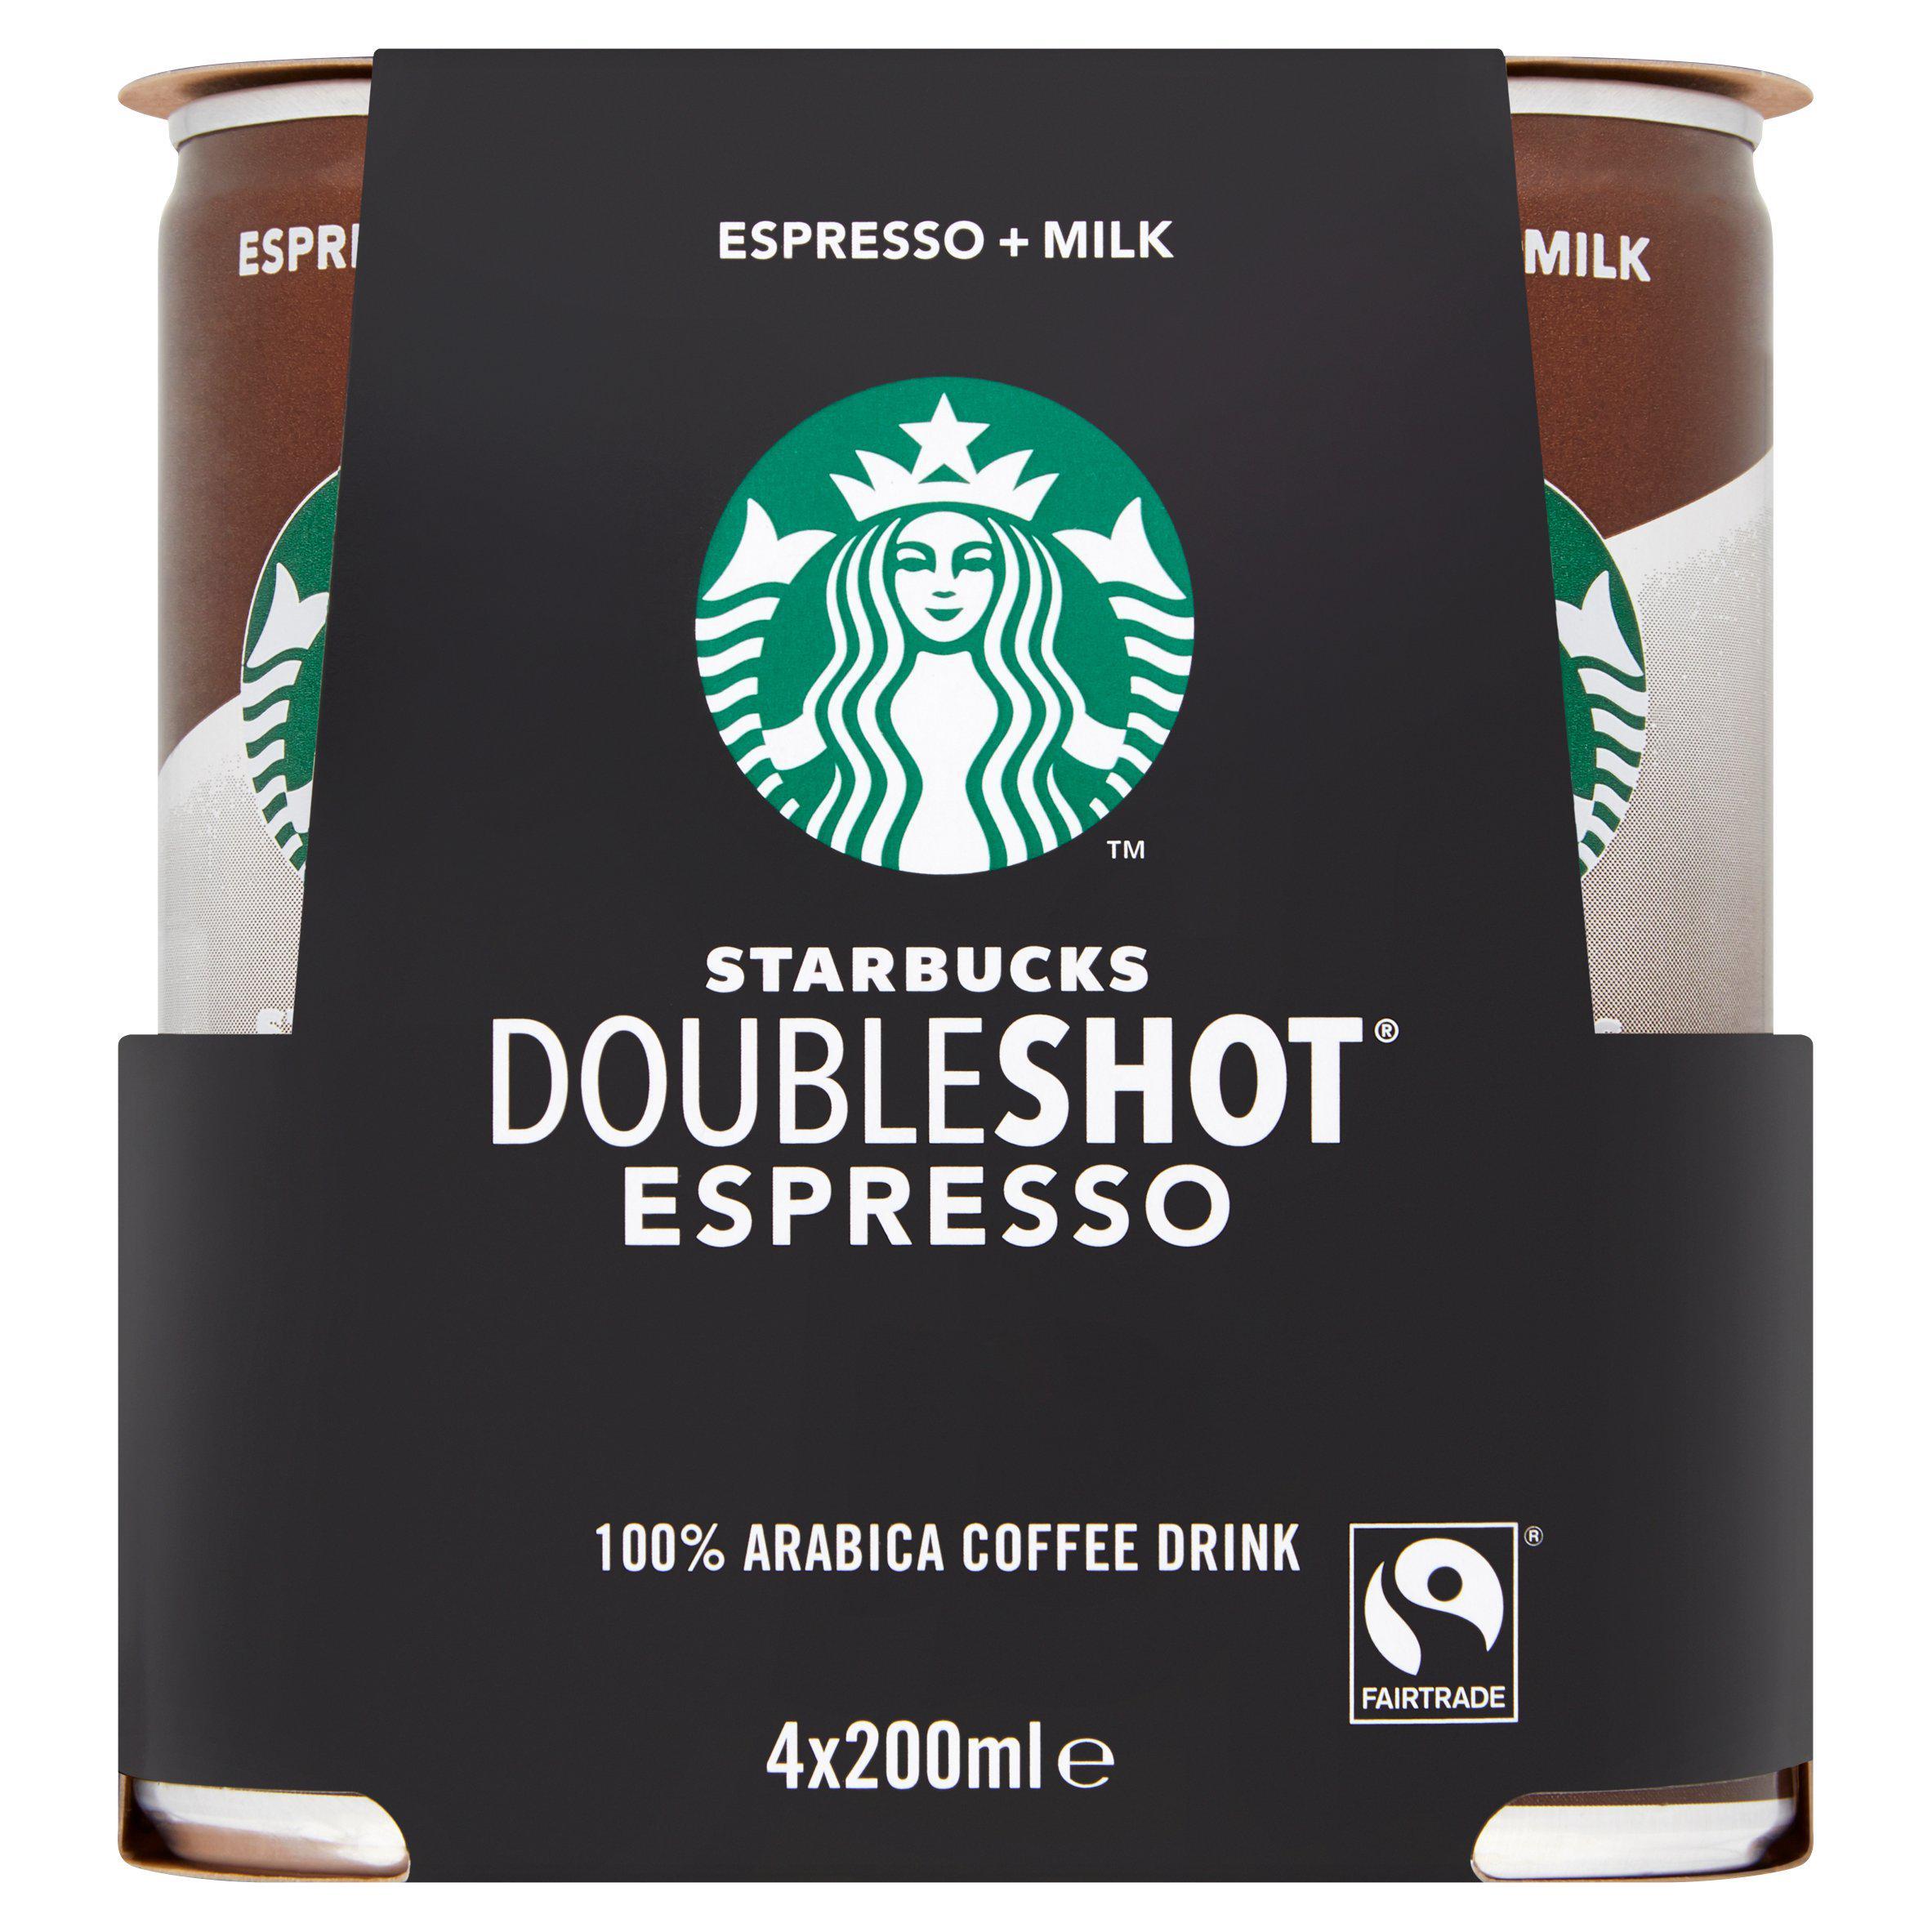 Starbucks Doubleshot Espresso 4x200ml - £3.50 @ Sainsbury's